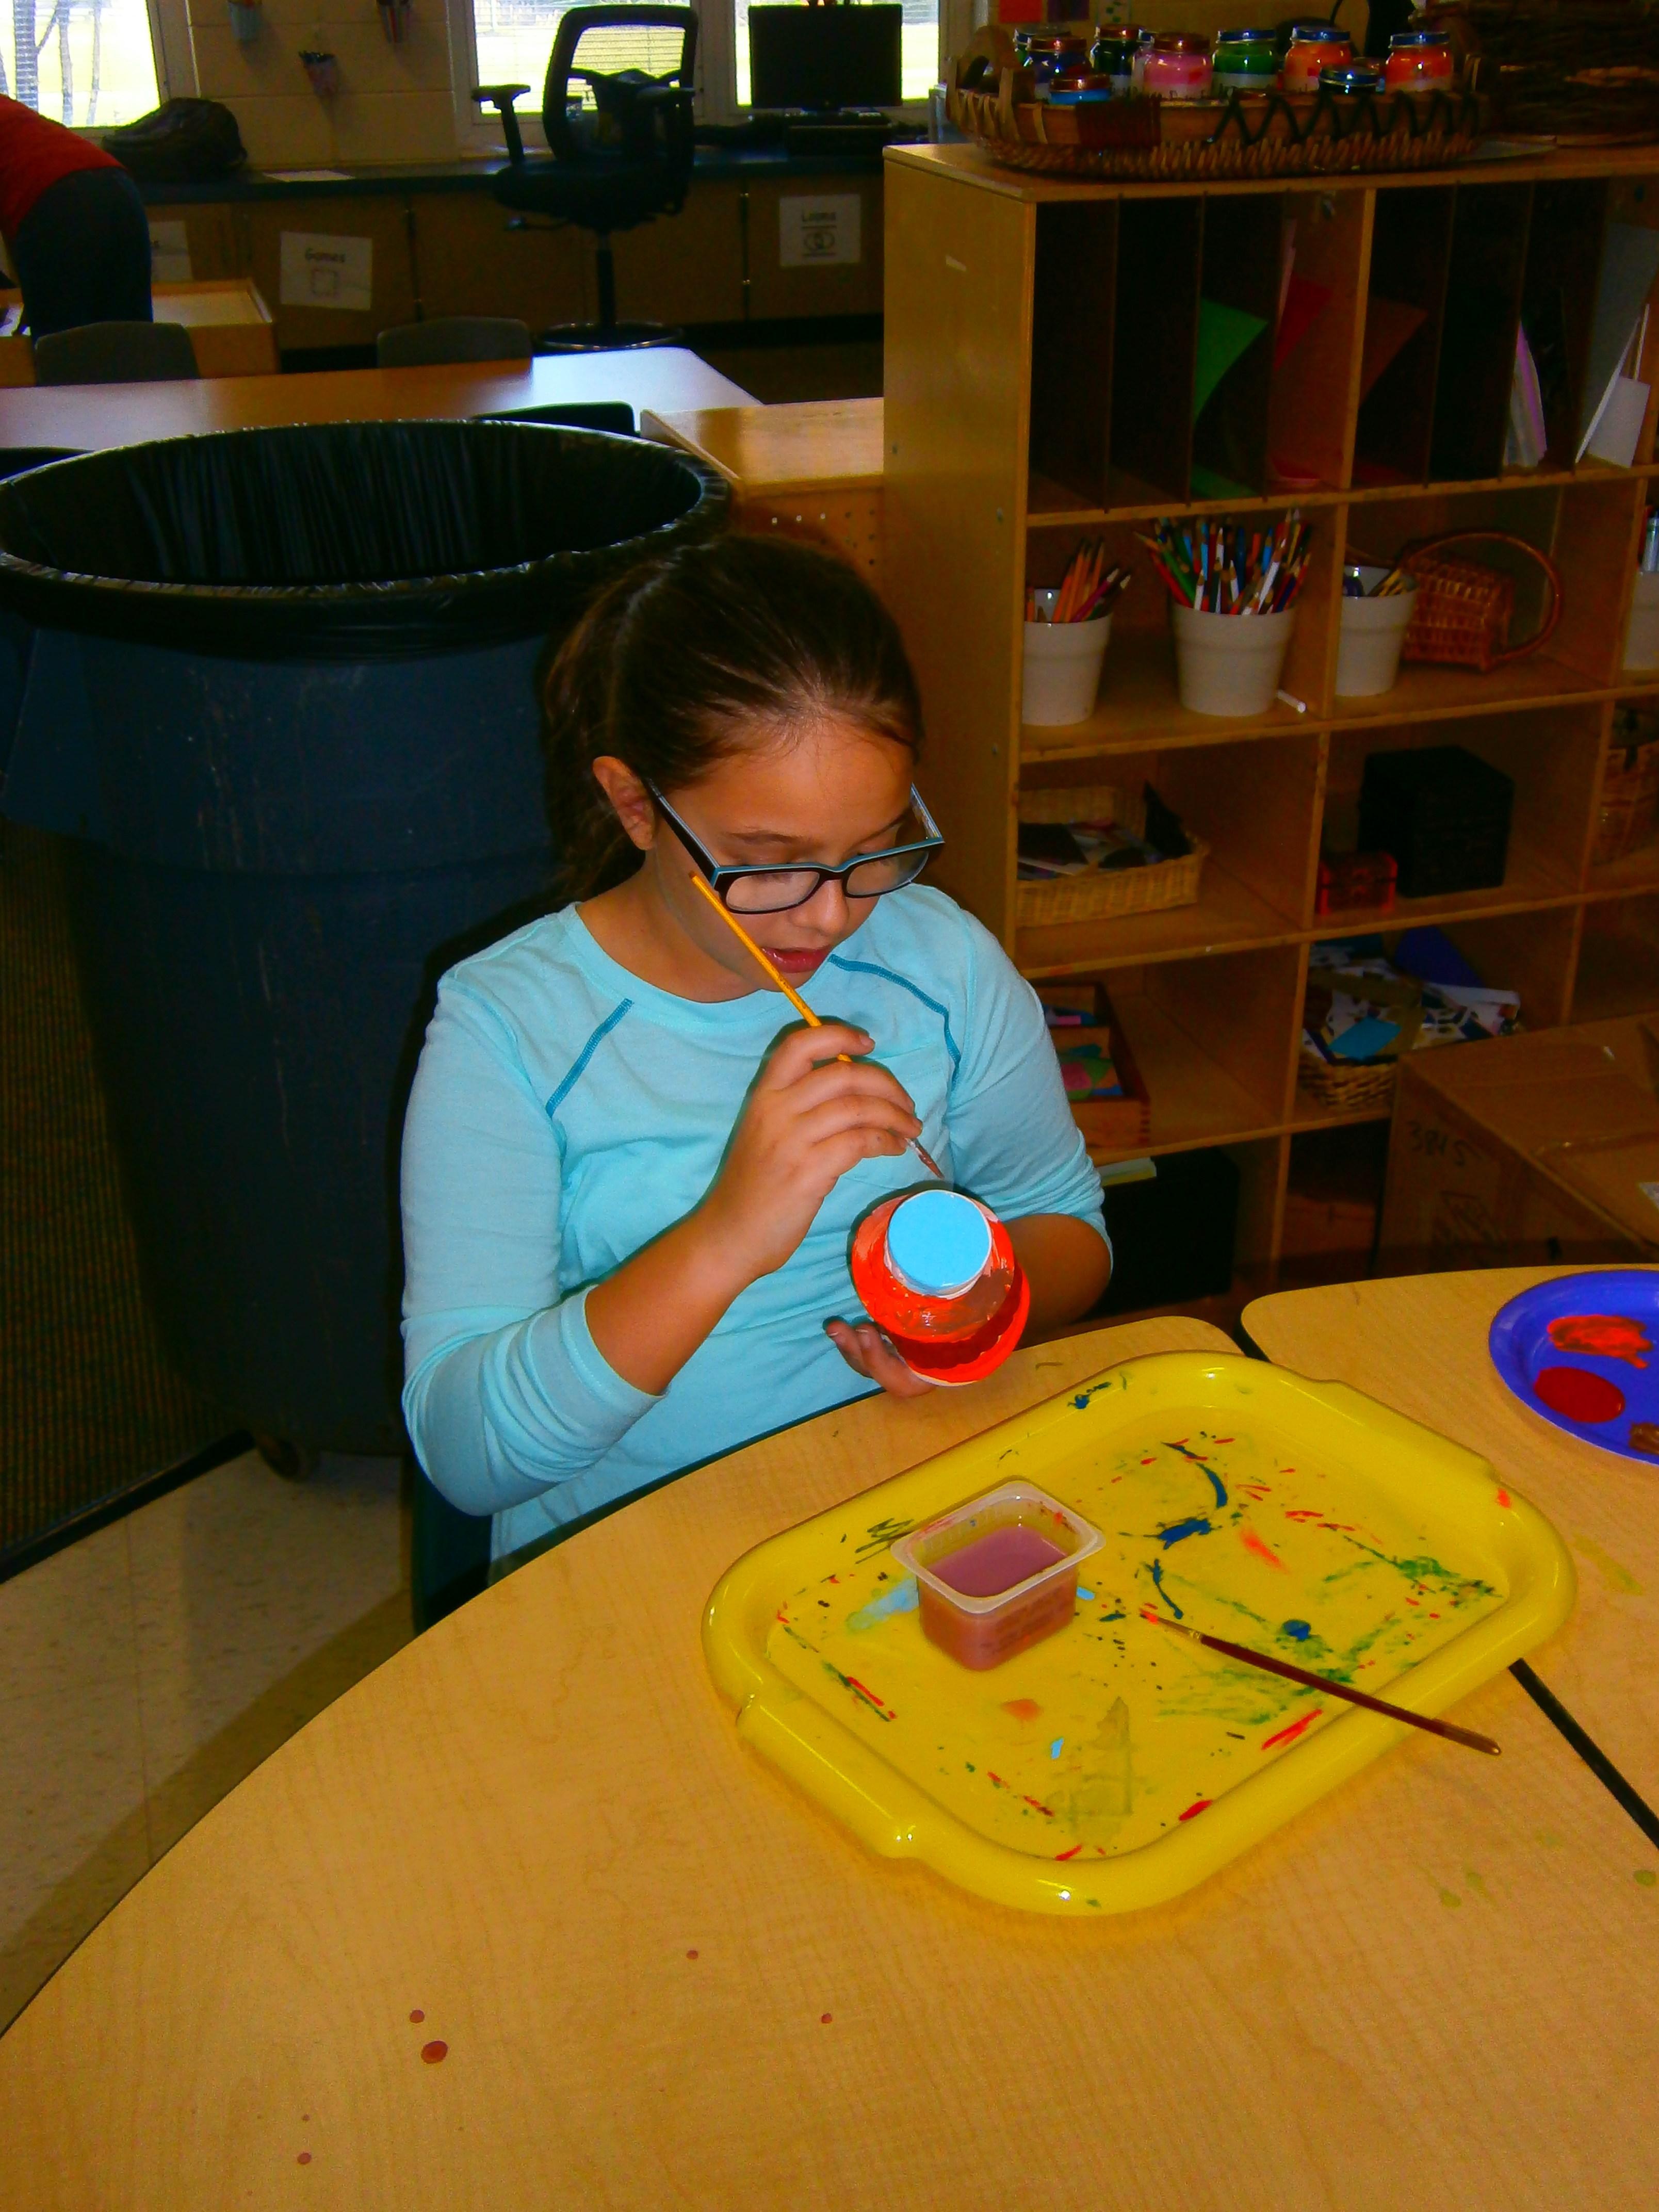 Girl painting a ceramic bowl.